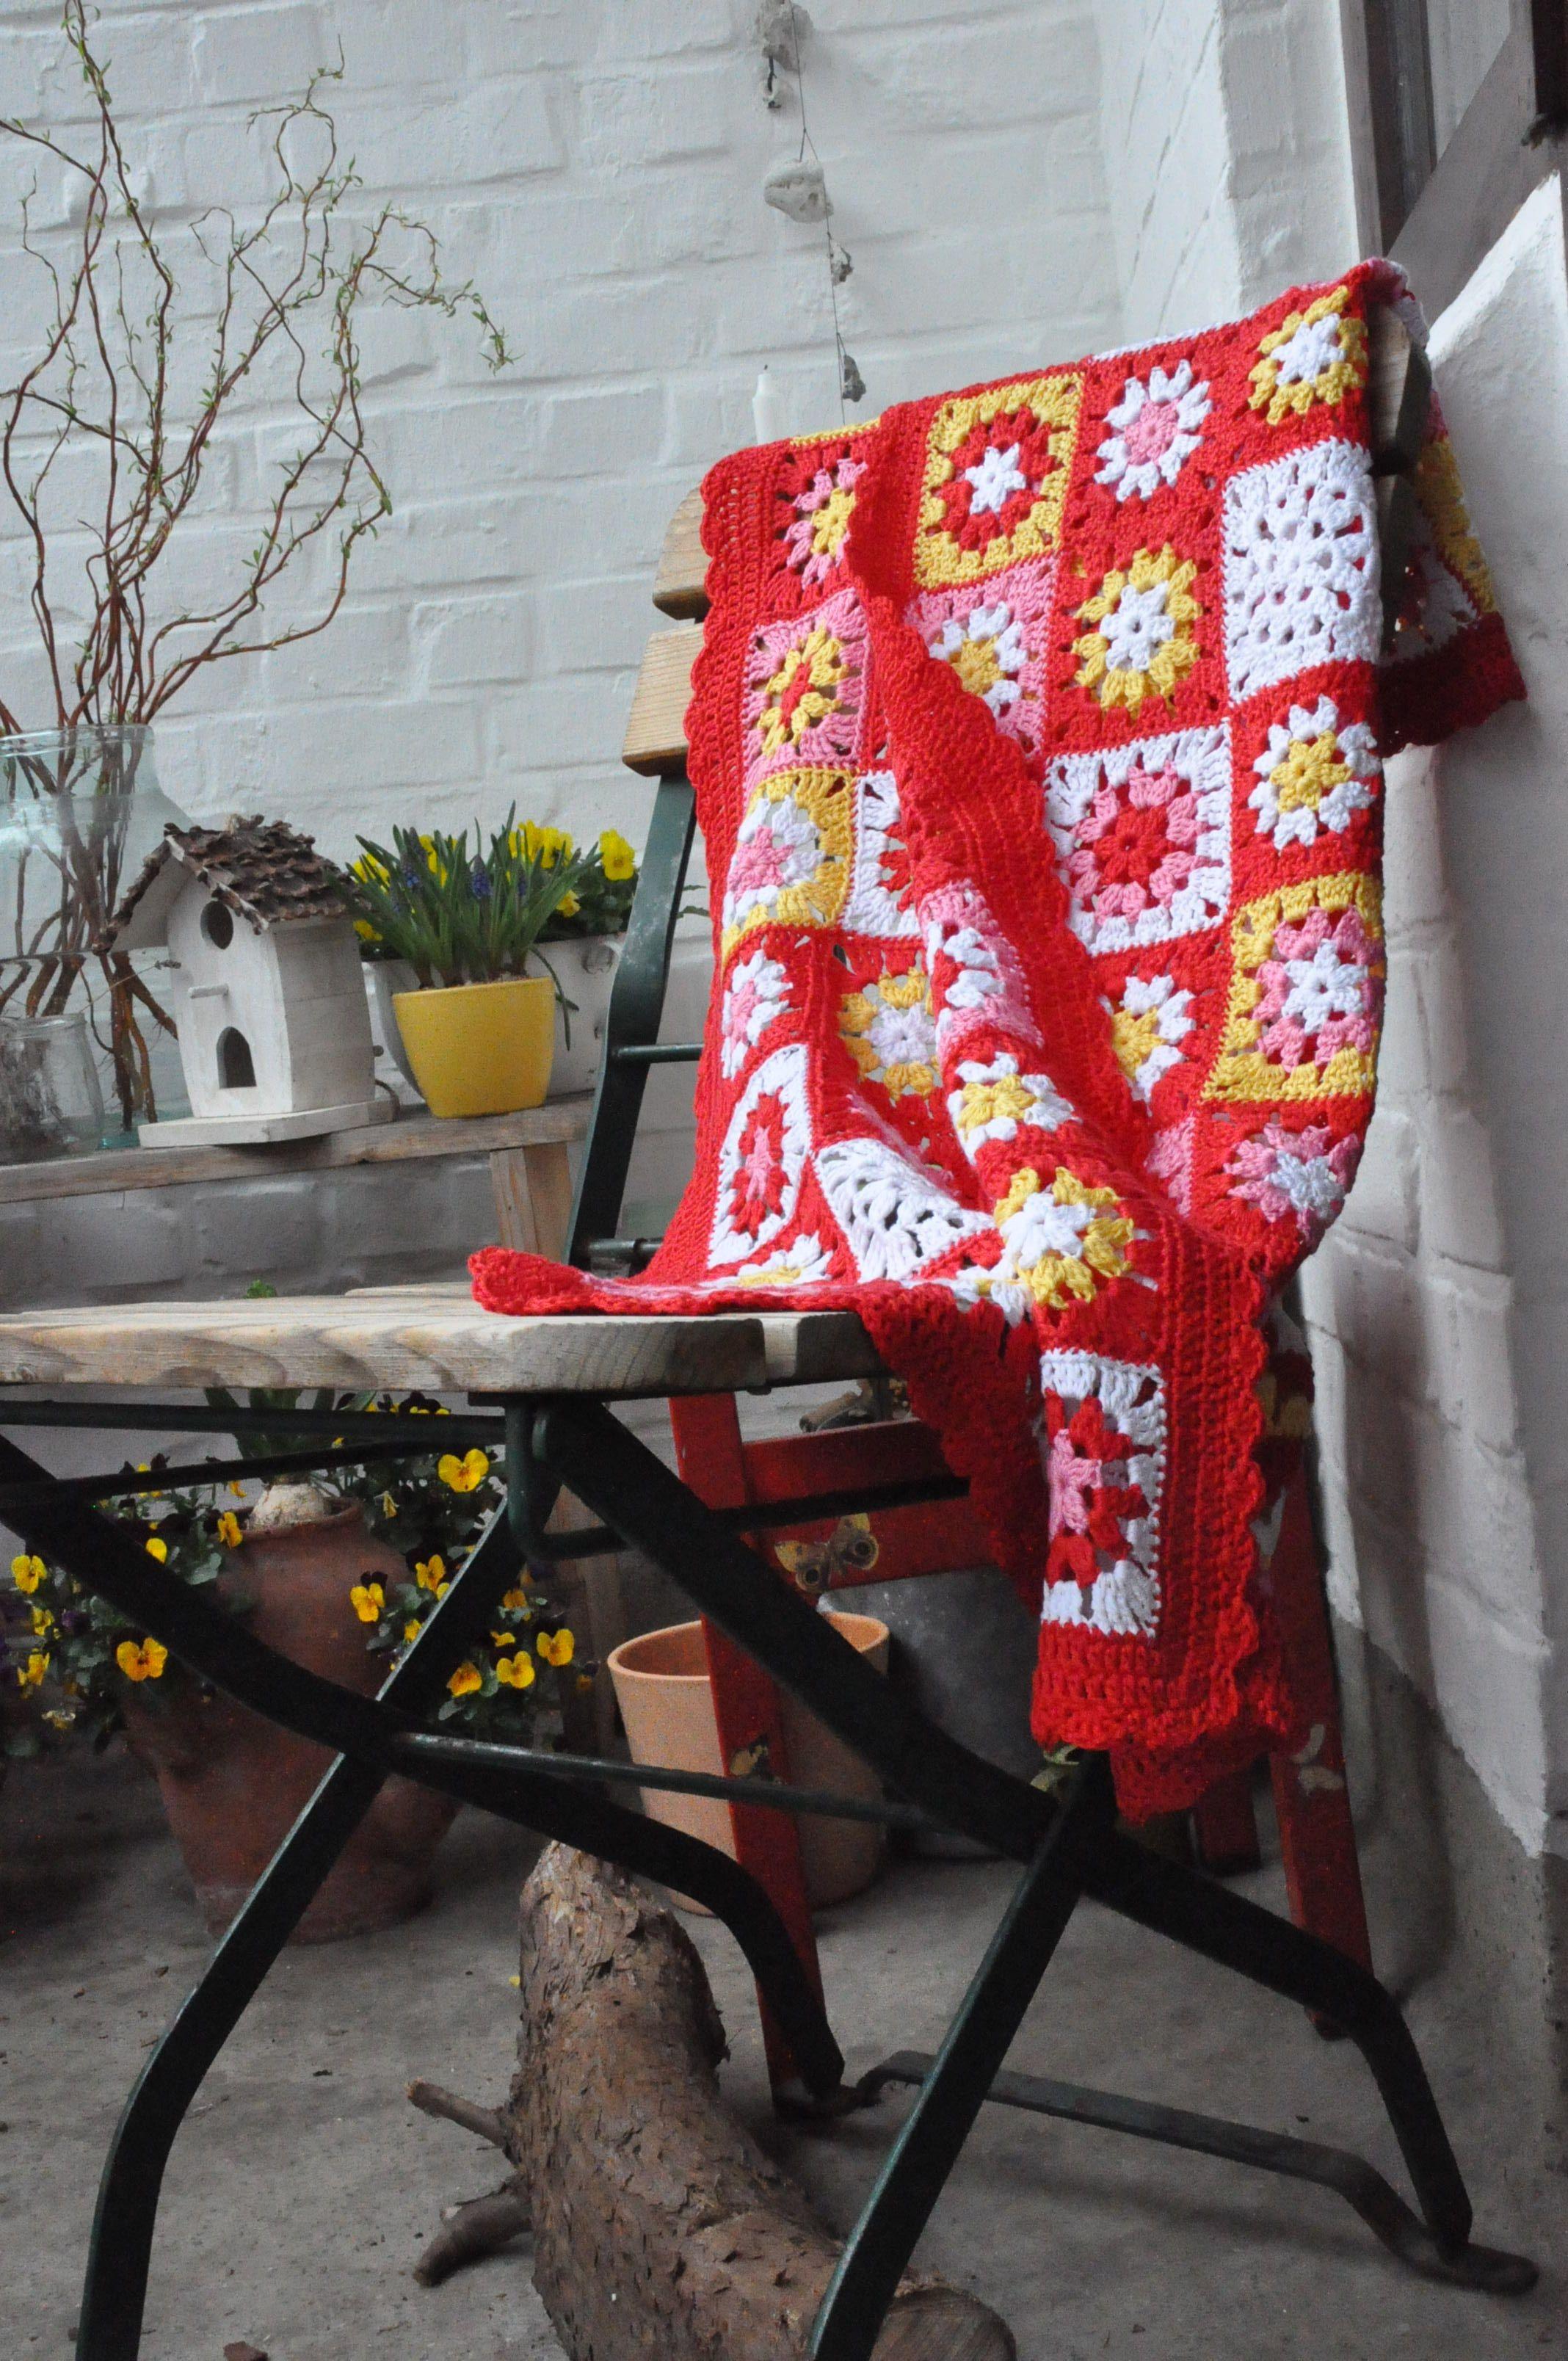 Rote Kleine Decke With Rote Decke